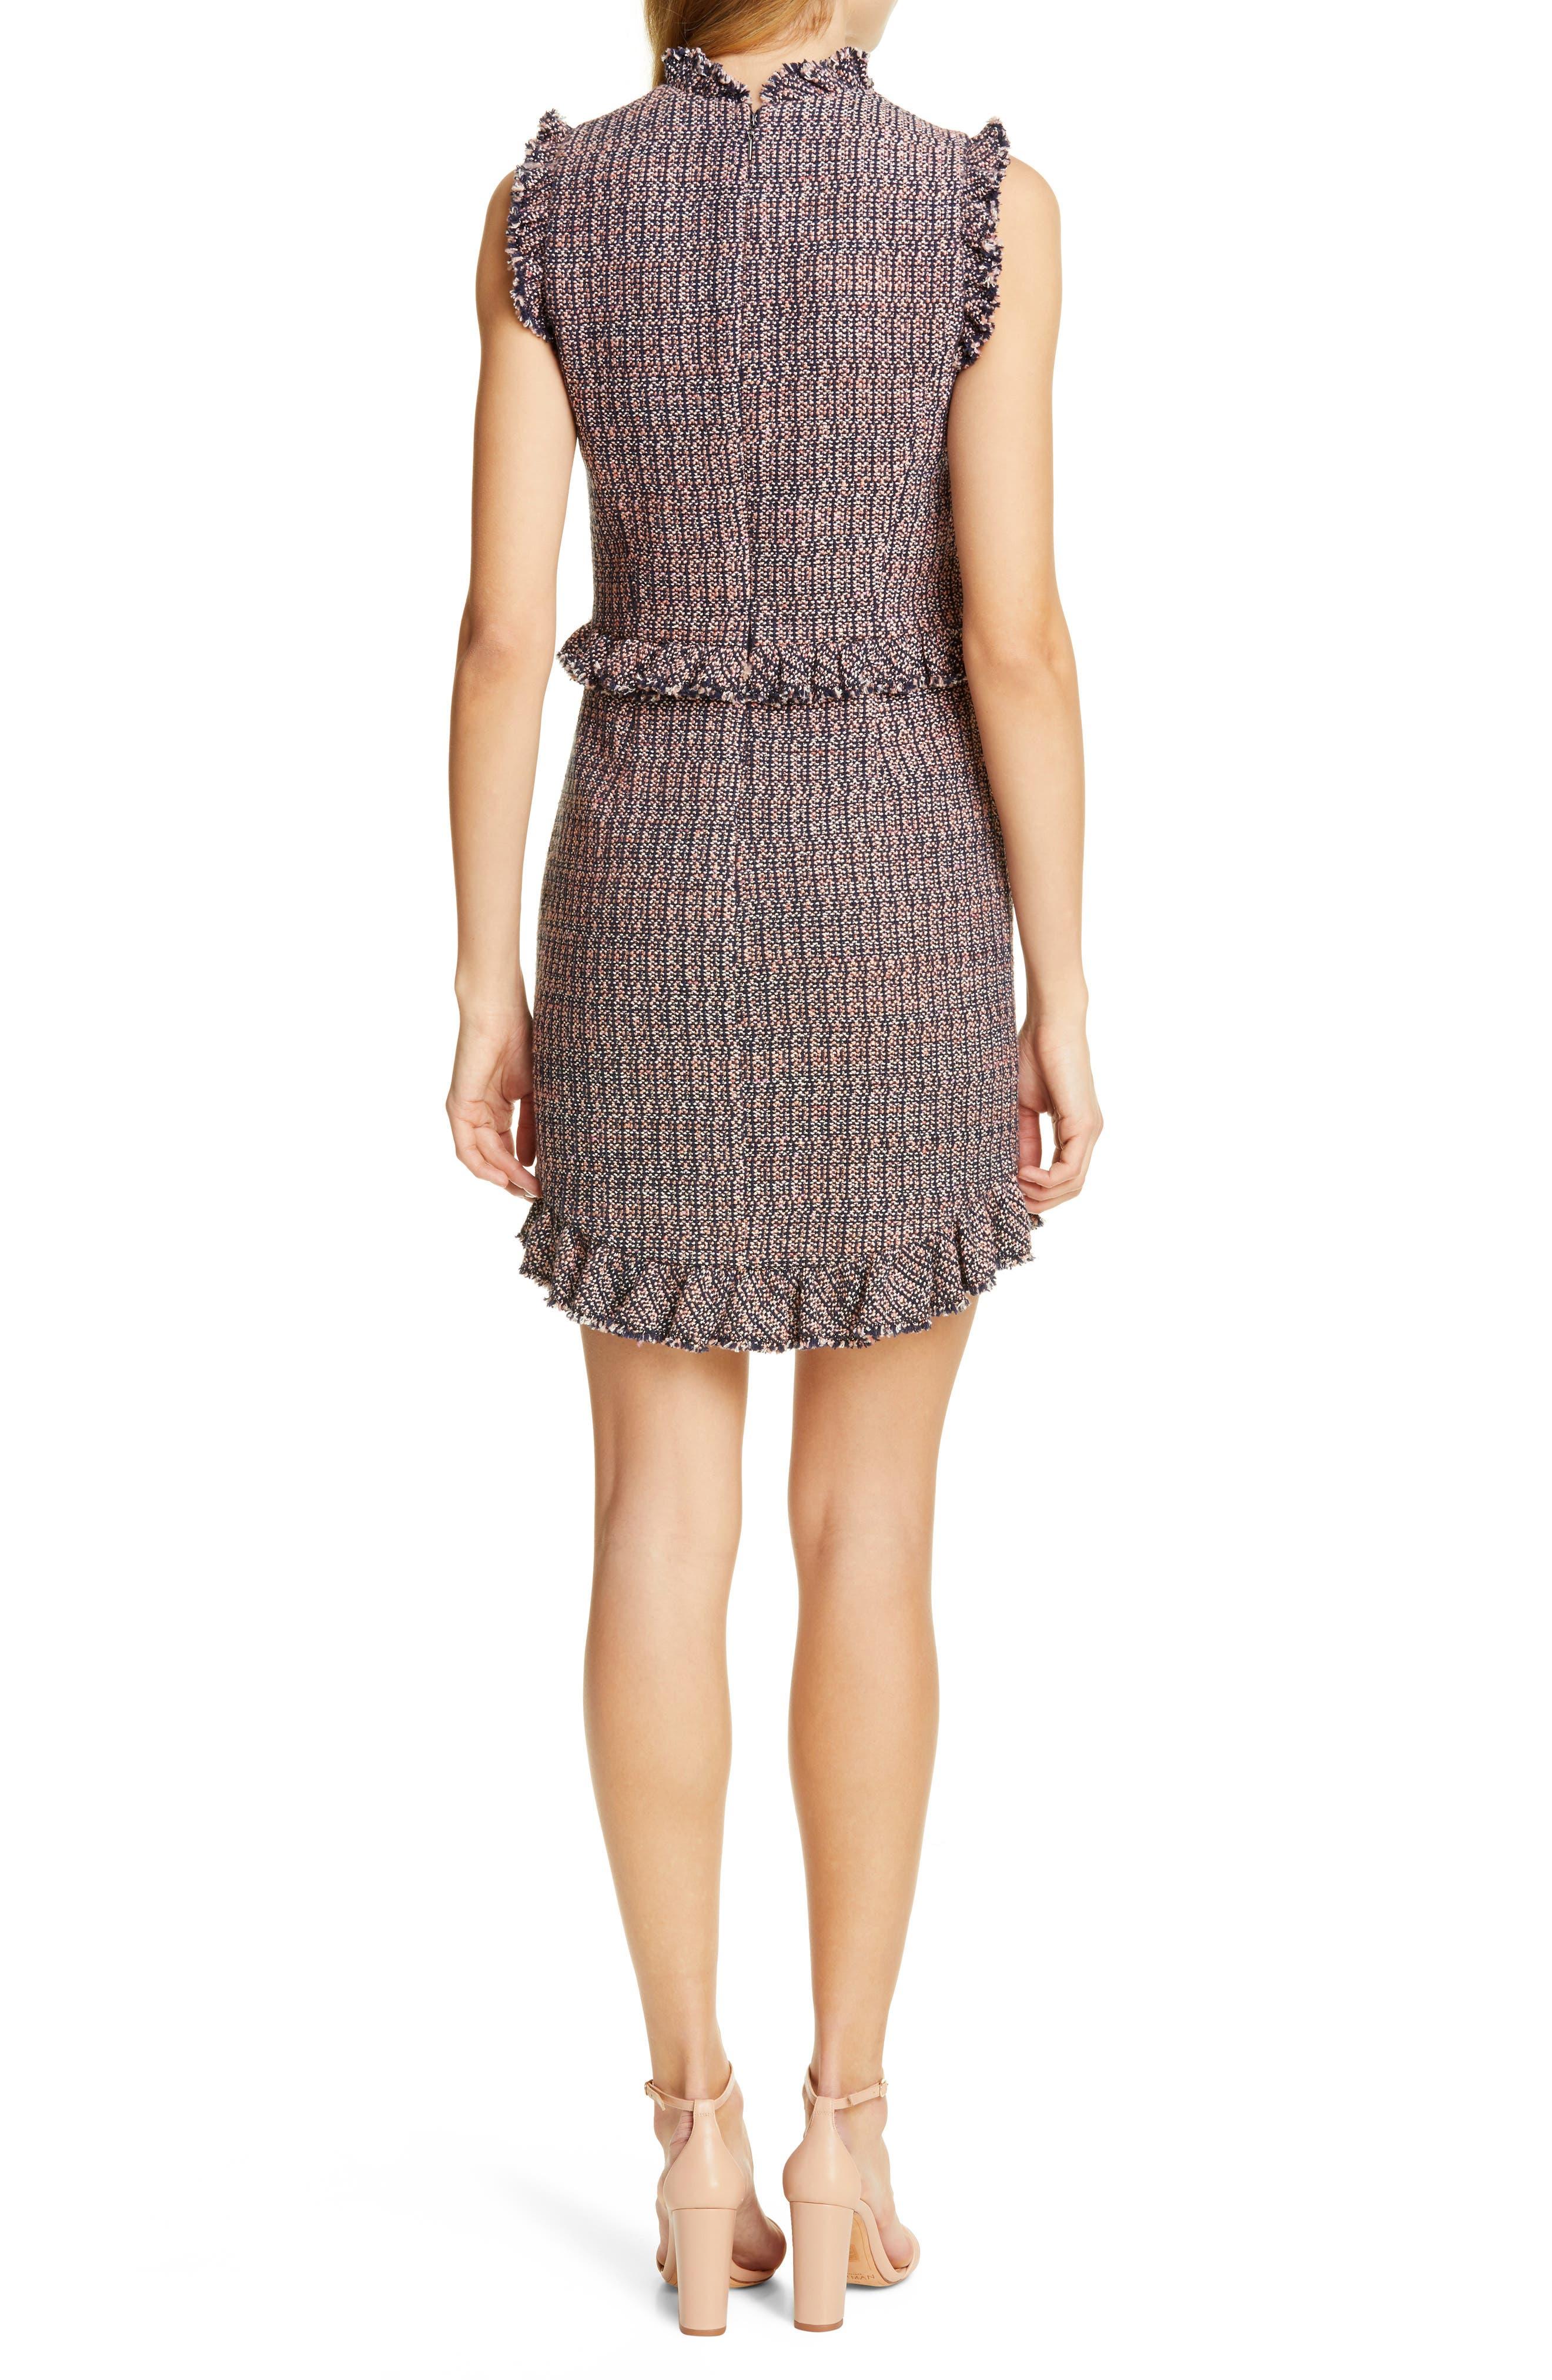 REBECCA TAYLOR, Frayed Ruffle Tweed Dress, Alternate thumbnail 2, color, PINK/ NAVY COMBO